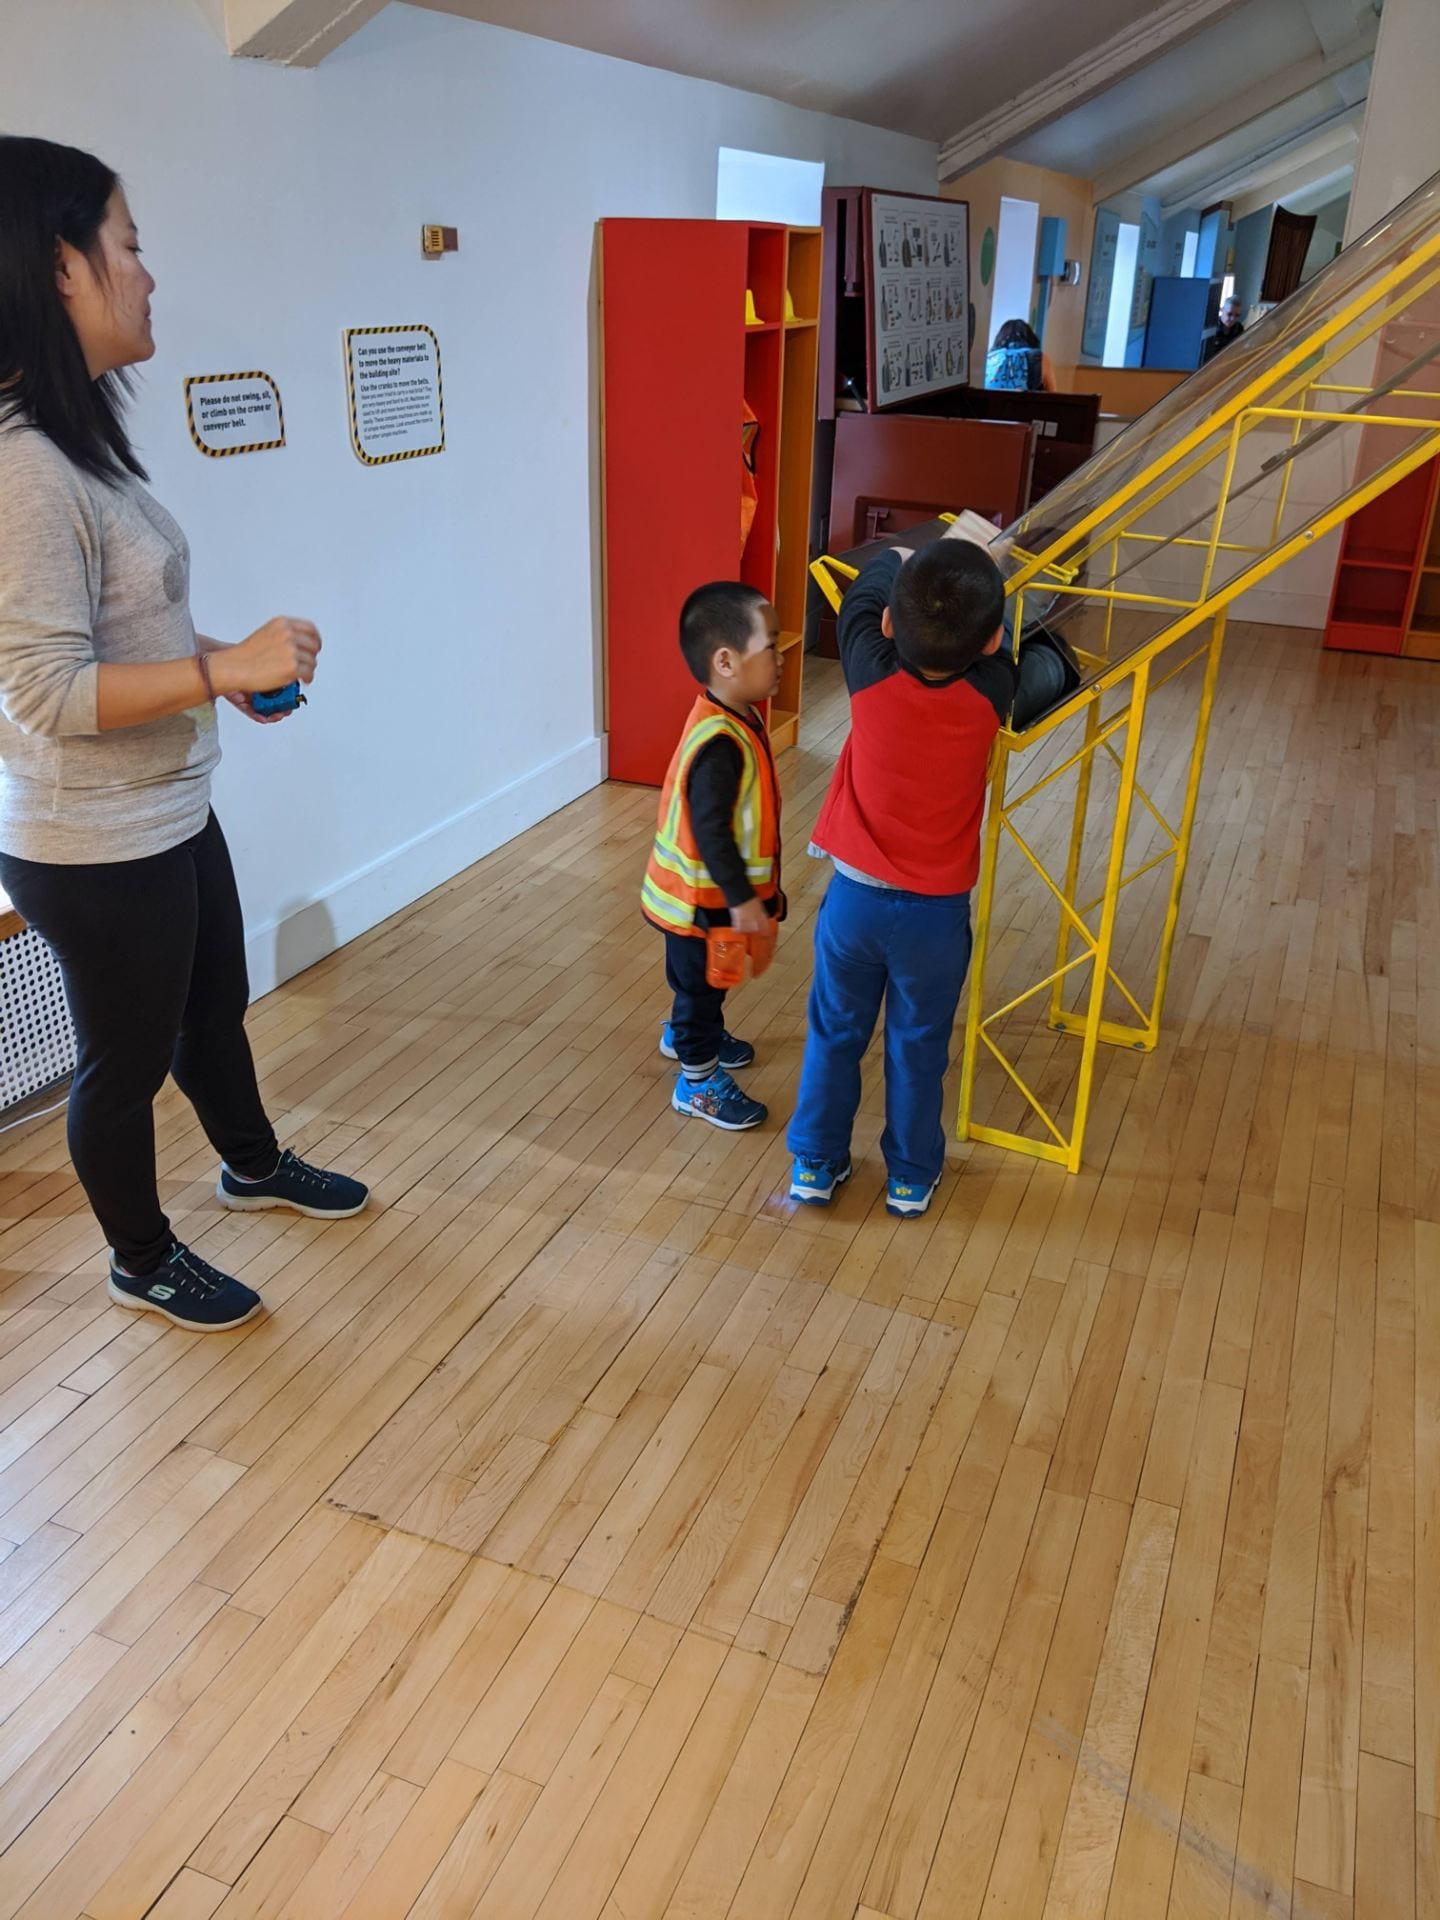 children exploring the children's museum